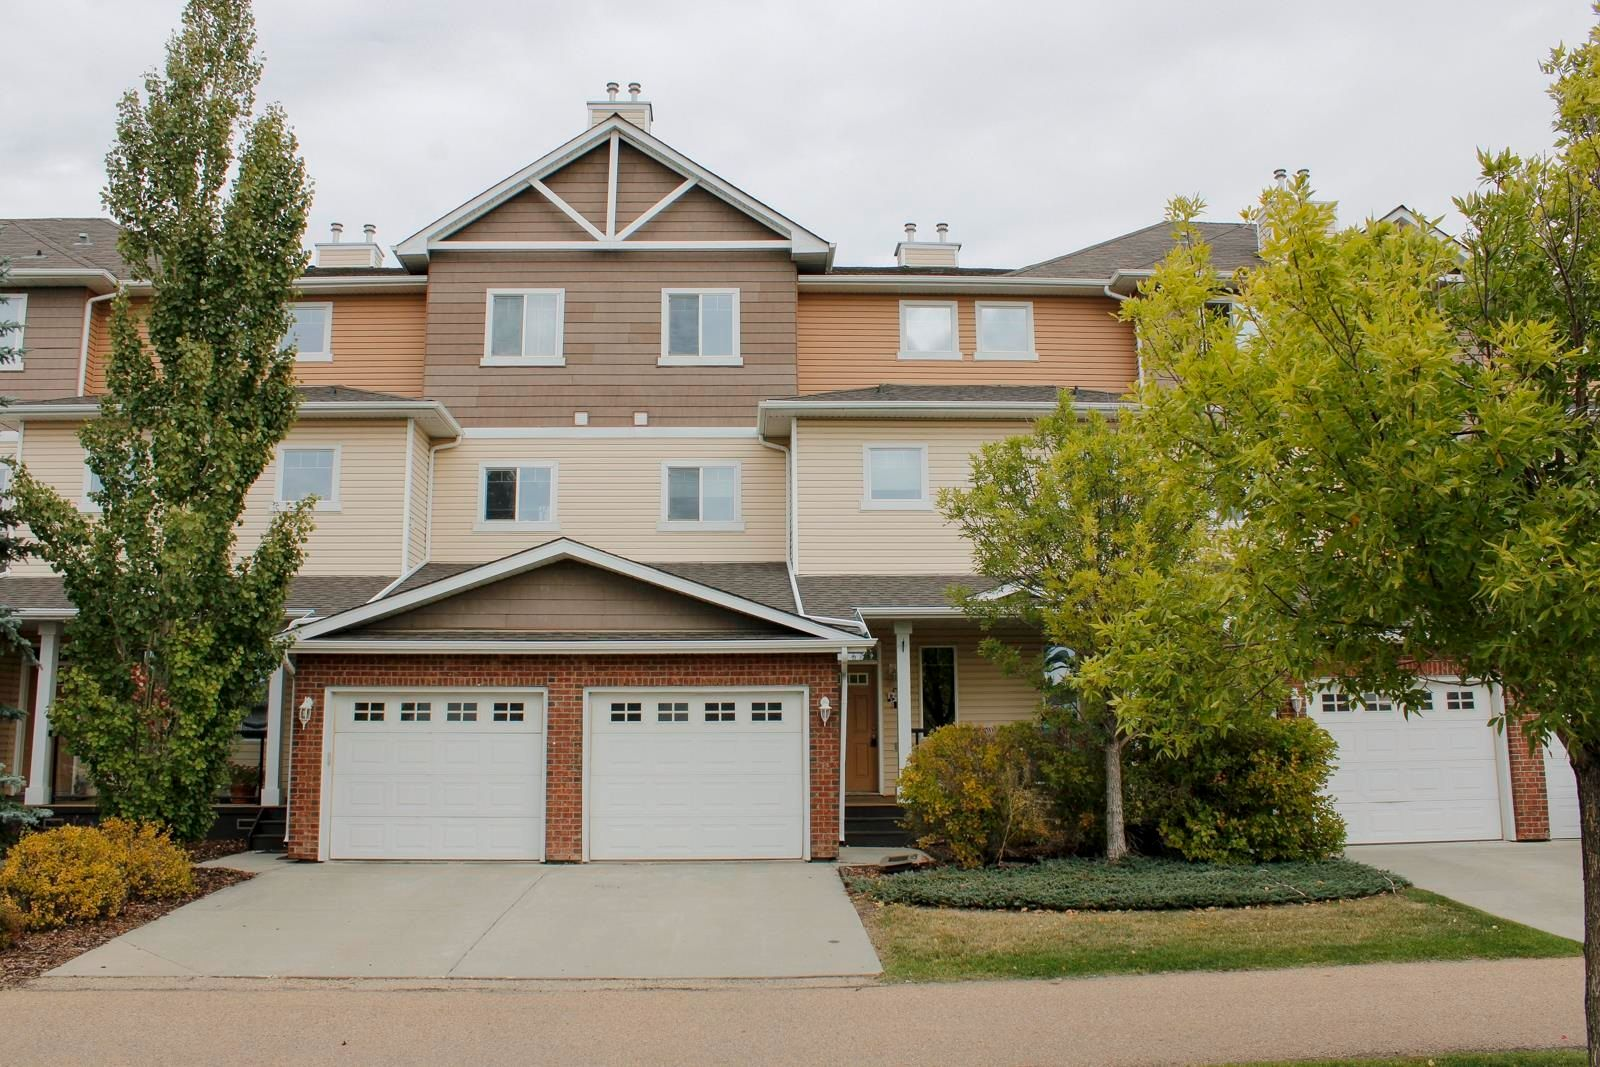 Main Photo: 9 3010 33 Avenue in Edmonton: Zone 30 Townhouse for sale : MLS®# E4263659